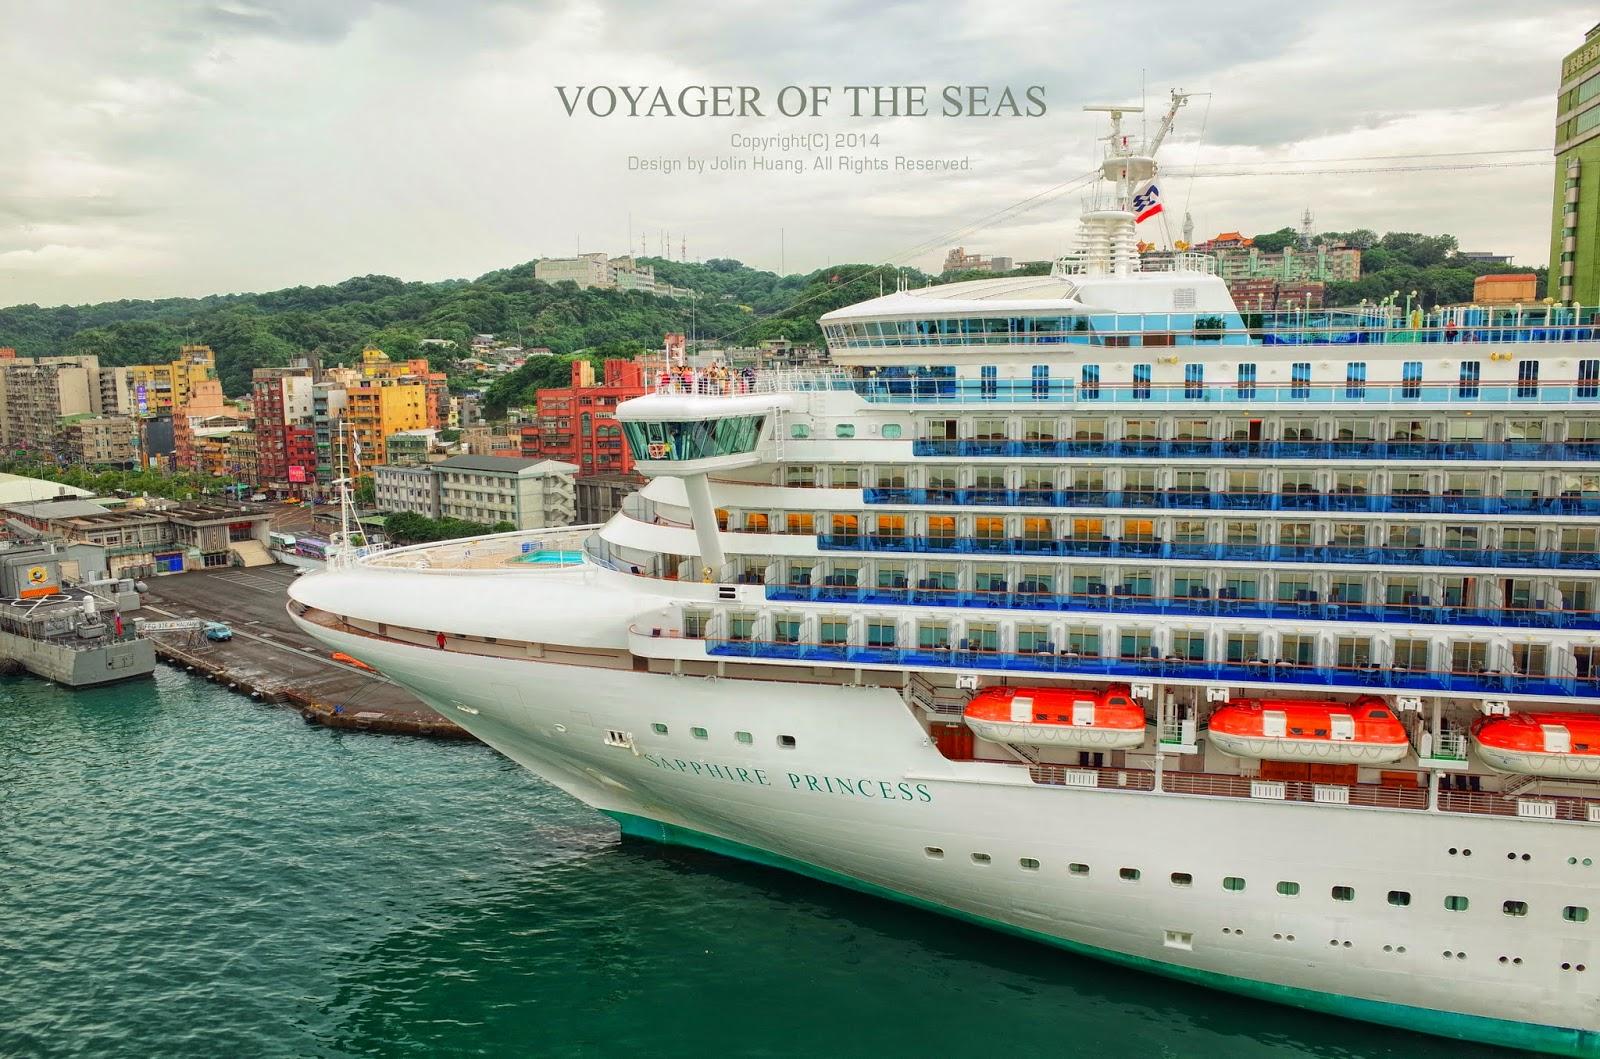 It's life : 皇家加勒比國際遊輪-海洋航行者號 Voyager of the seas(第二天行程)